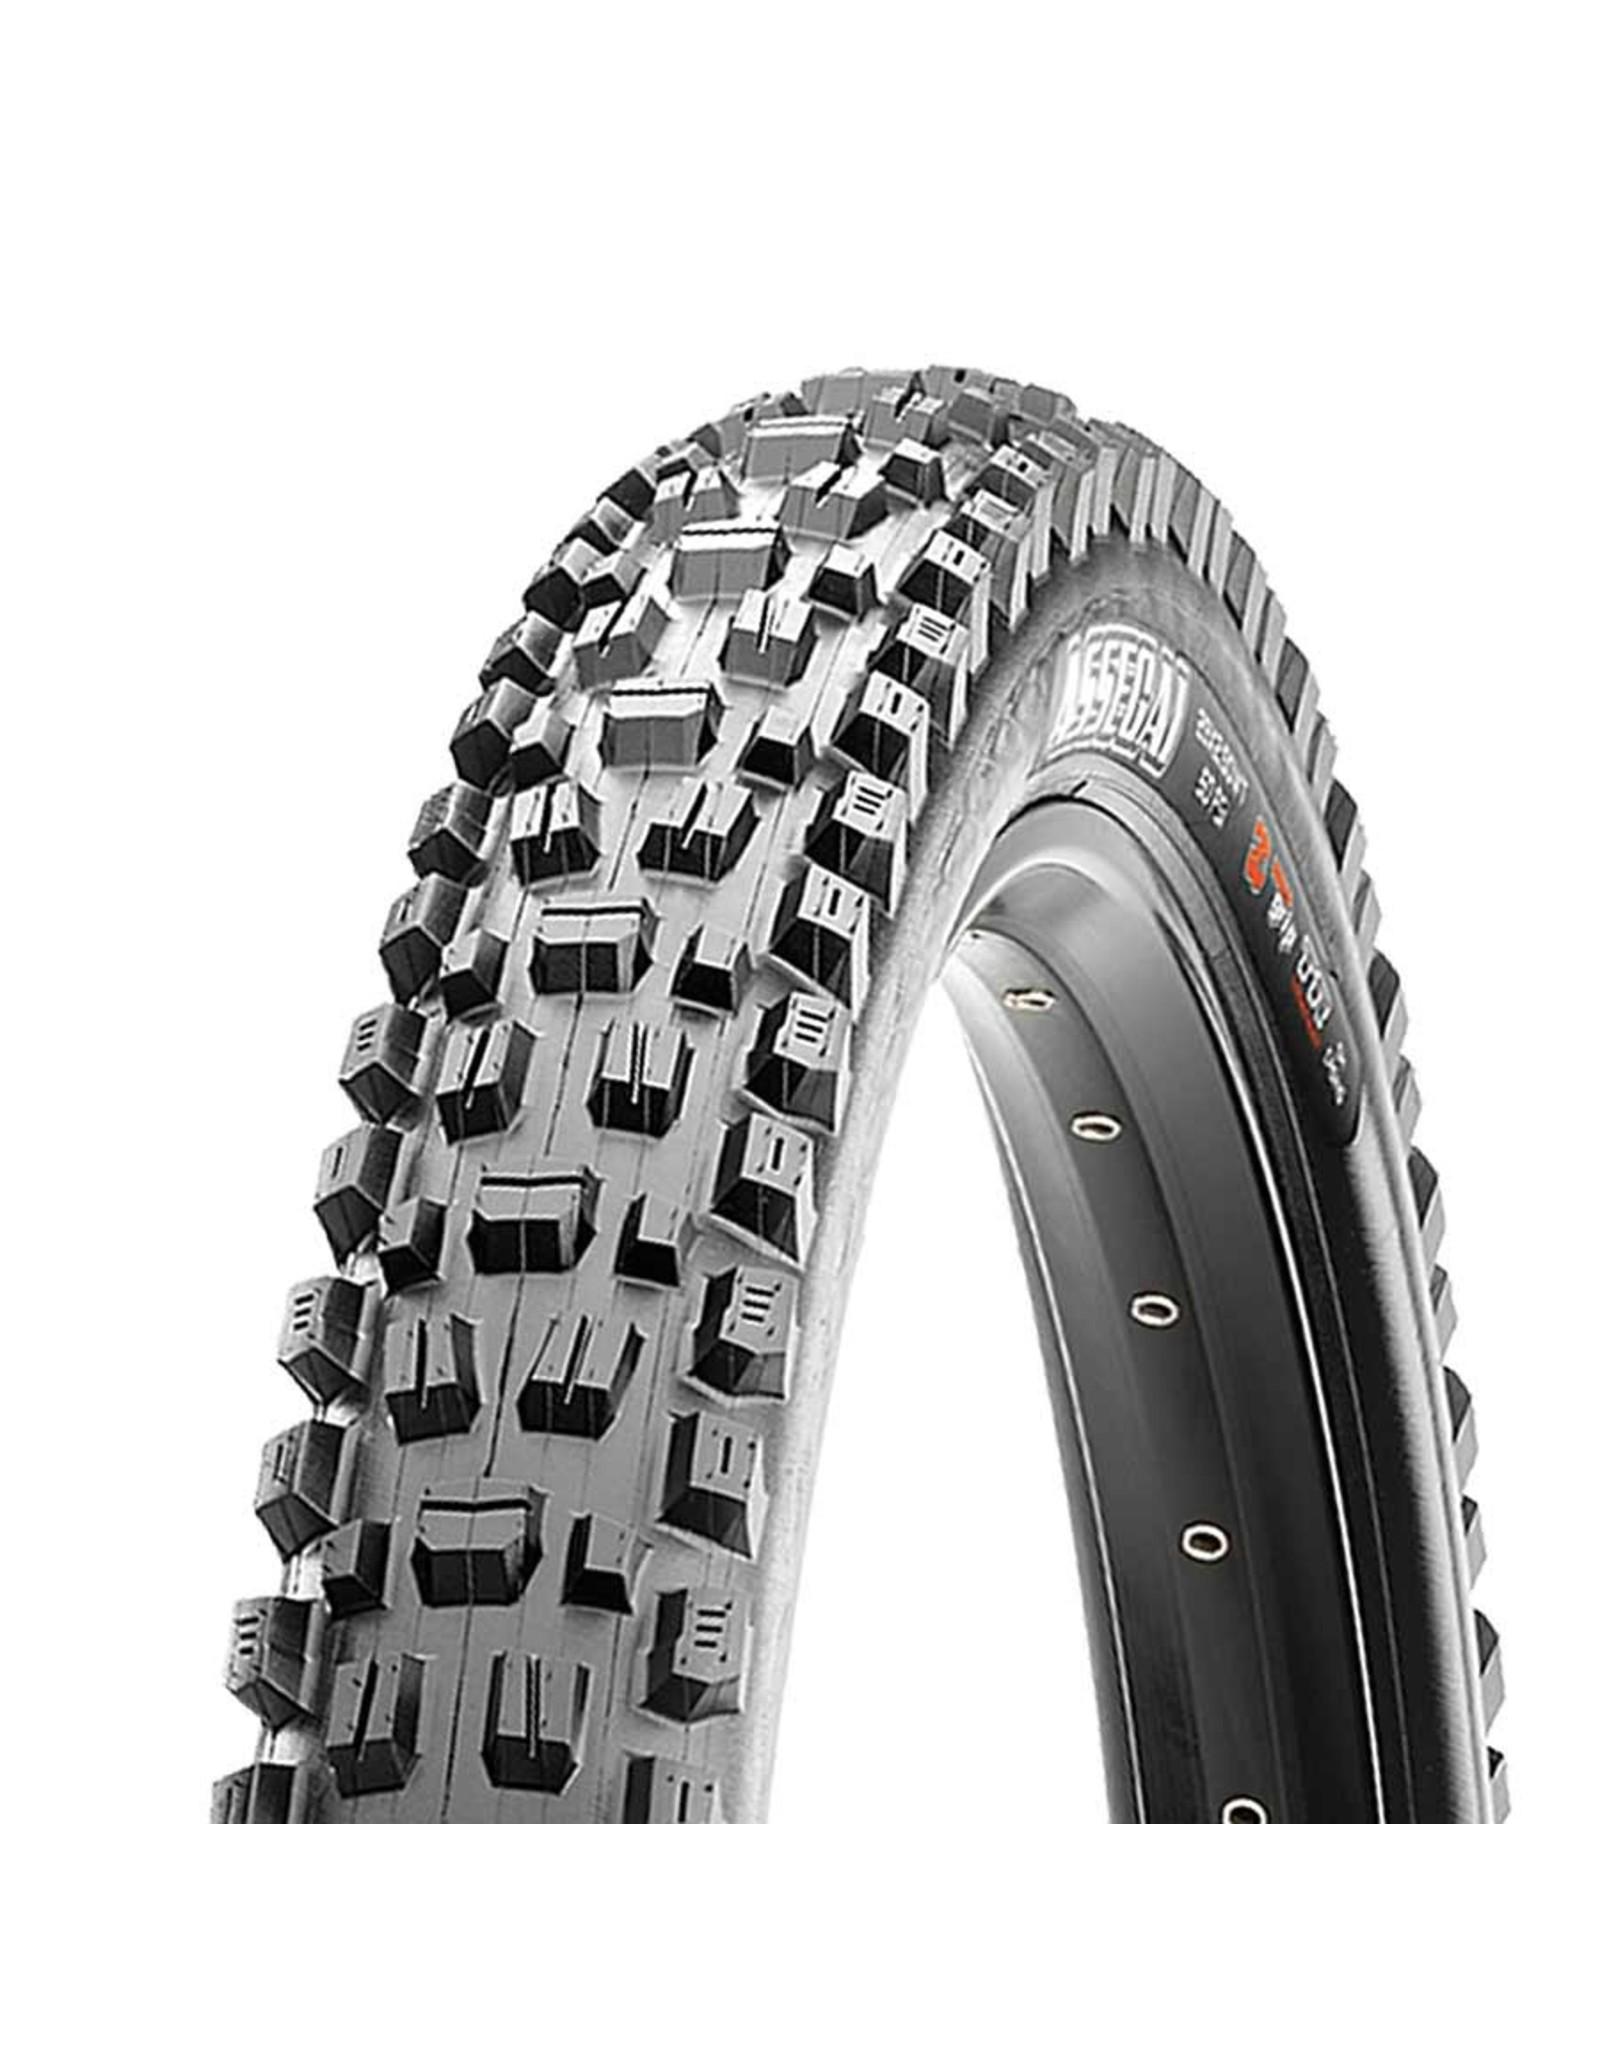 Maxxis Maxxis, Assegai, Tire, 29''x2.60, Folding, Tubeless Ready, Dual, EXO, Wide Trail, 60TPI, Black